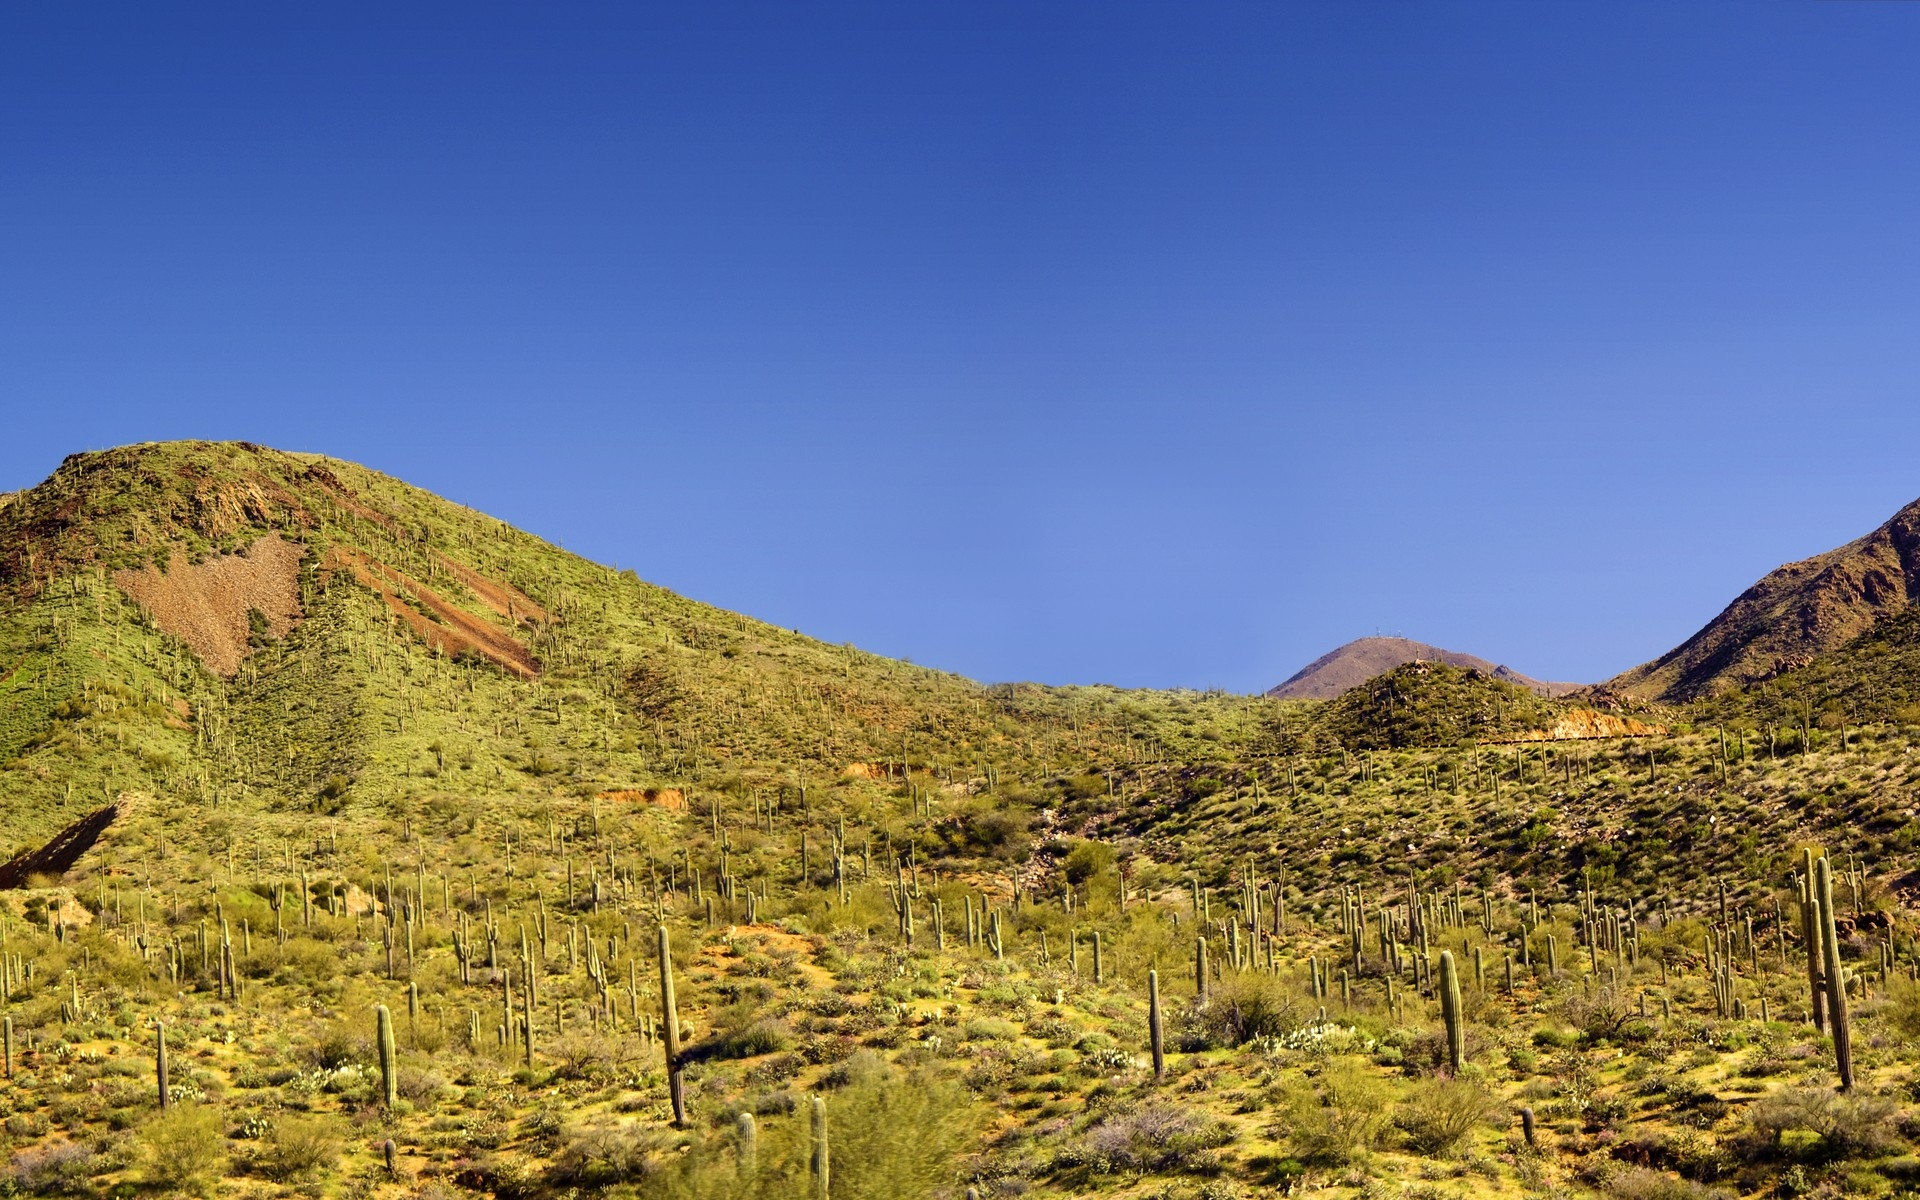 on the hills in the desert HD Desktop Wallpaper HD Desktop Wallpaper 1920x1200